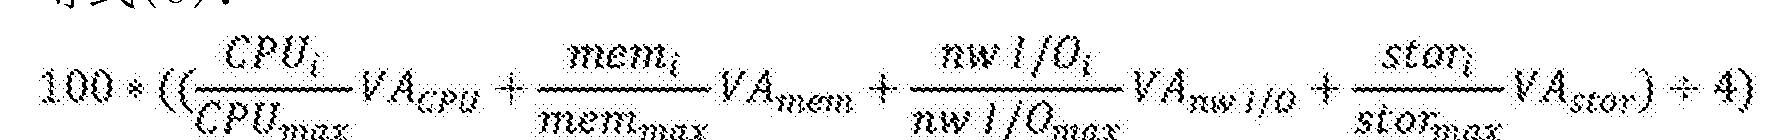 Figure CN105940378AD00121